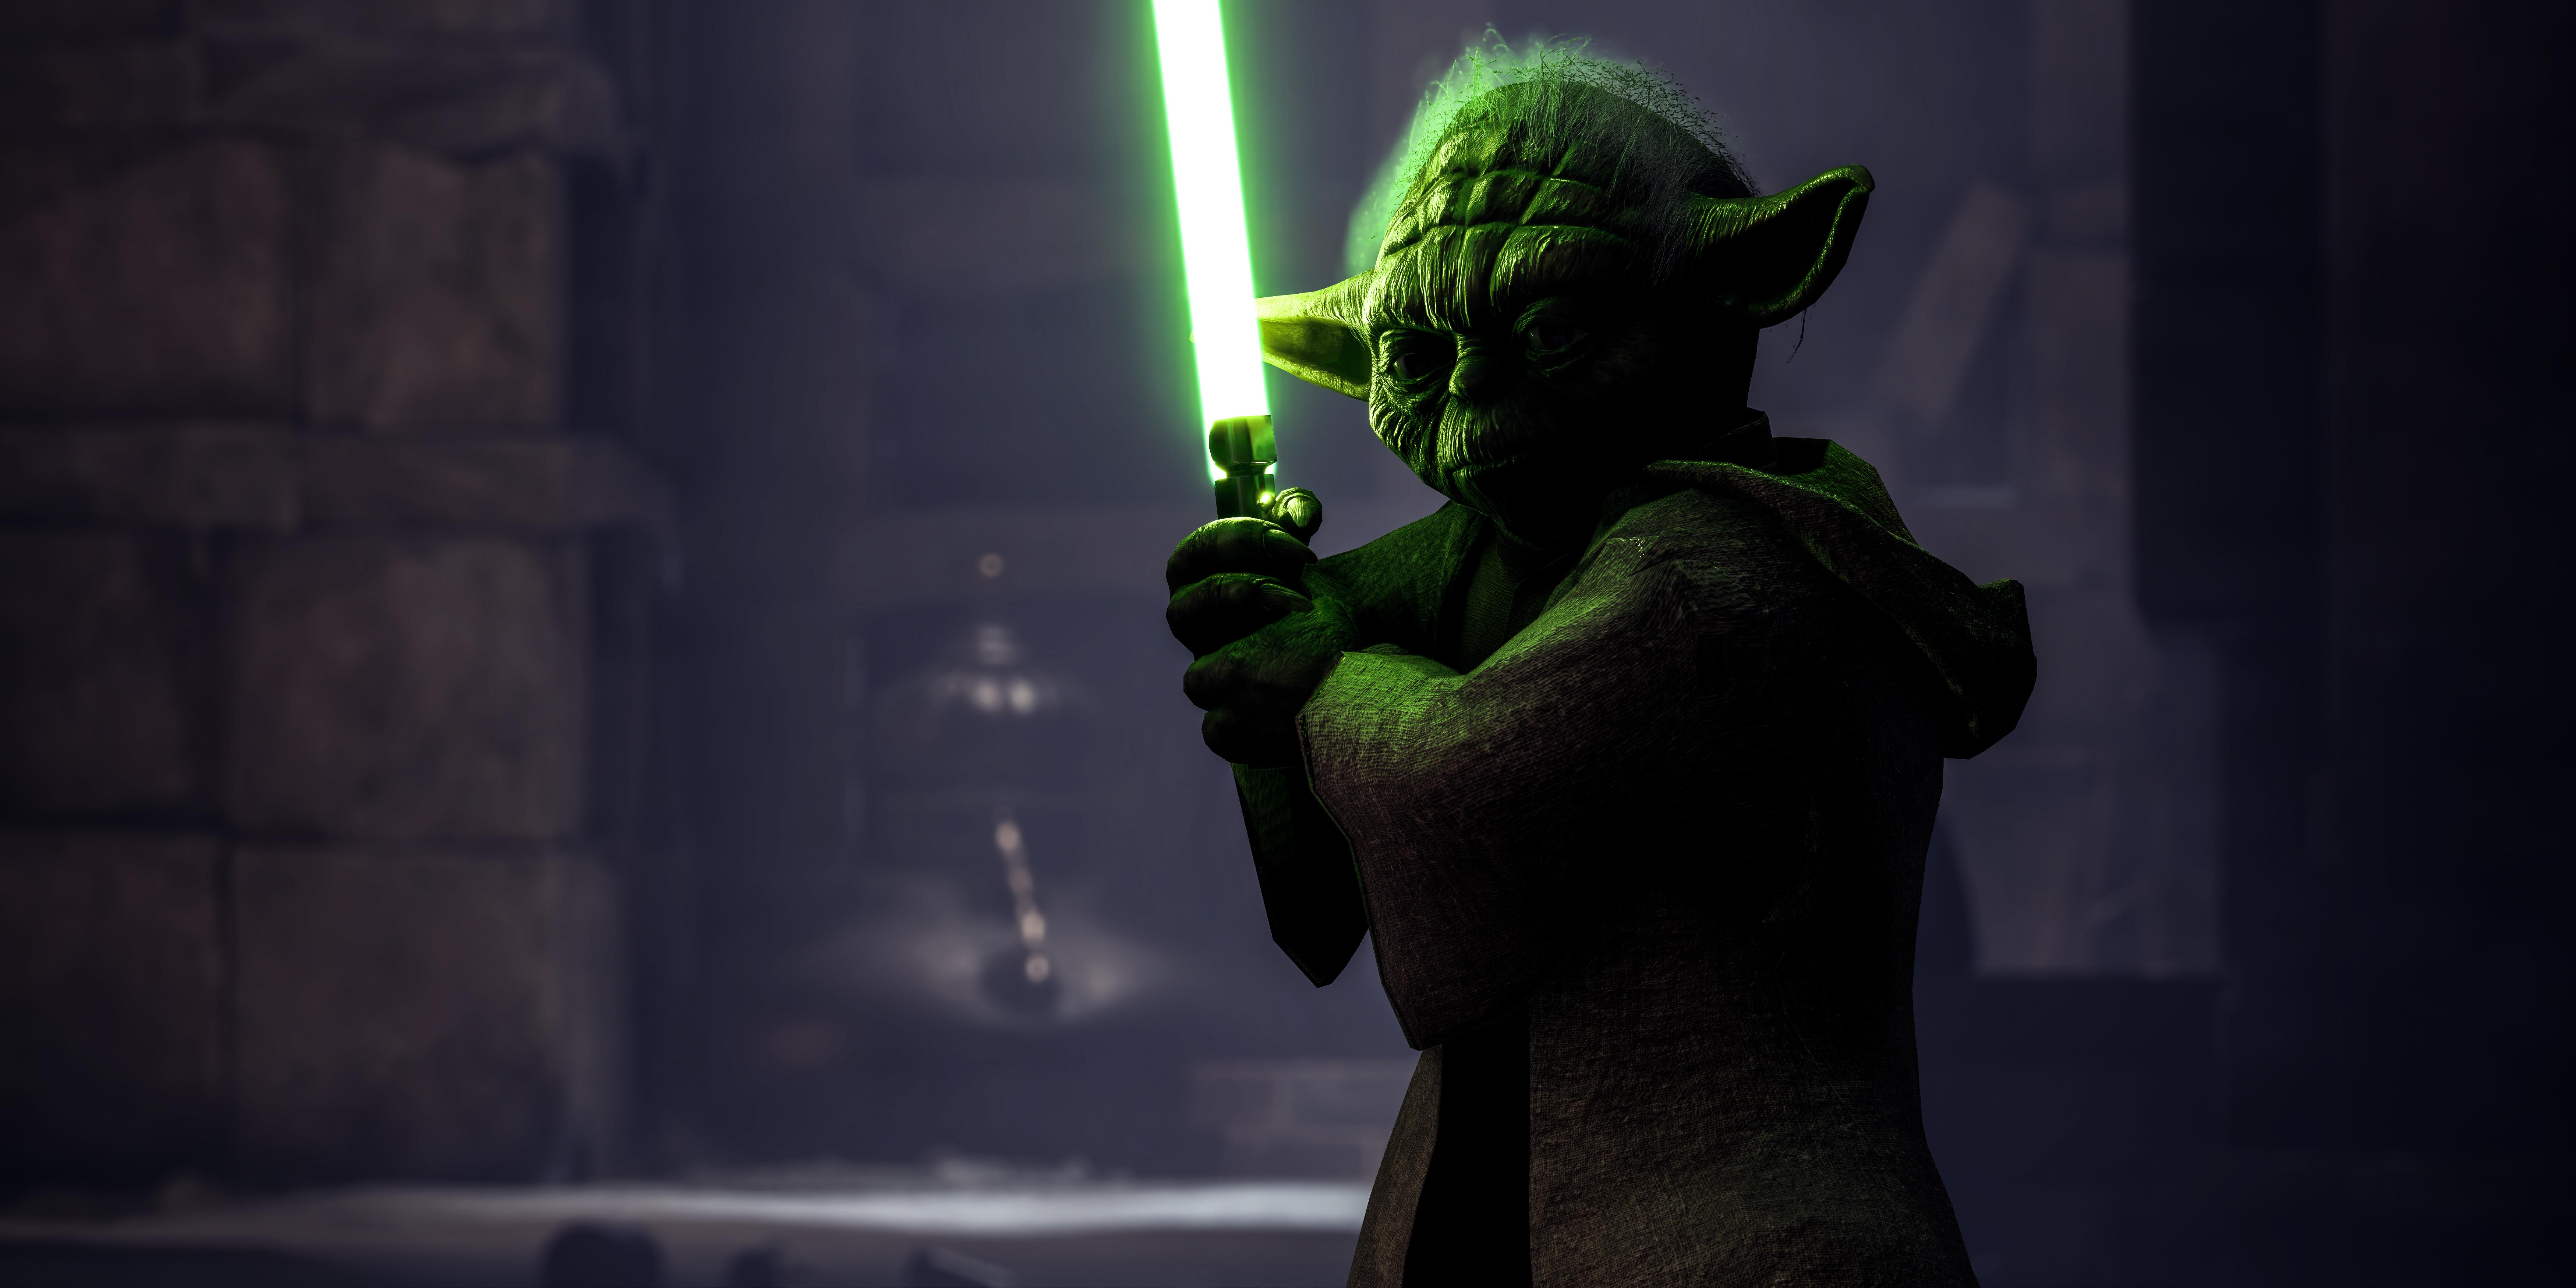 Star Wars Battlefront Ii Yoda 4k Ultra Hd Wallpaper Background Image 7000x3500